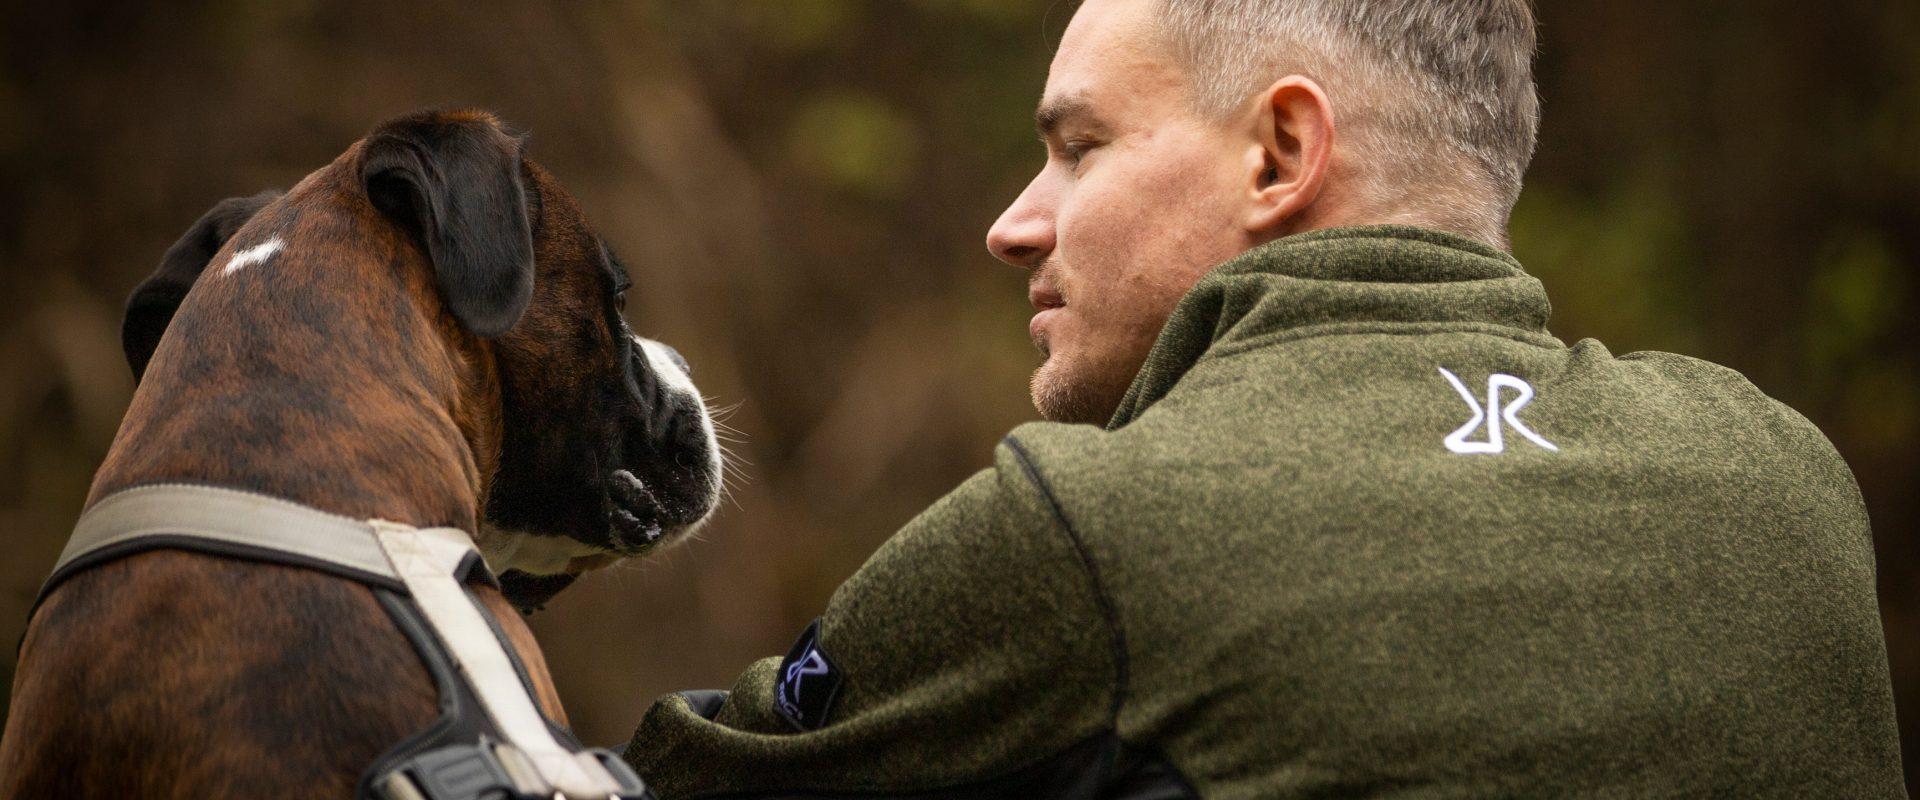 Hundetrainer aus Leidenschaft